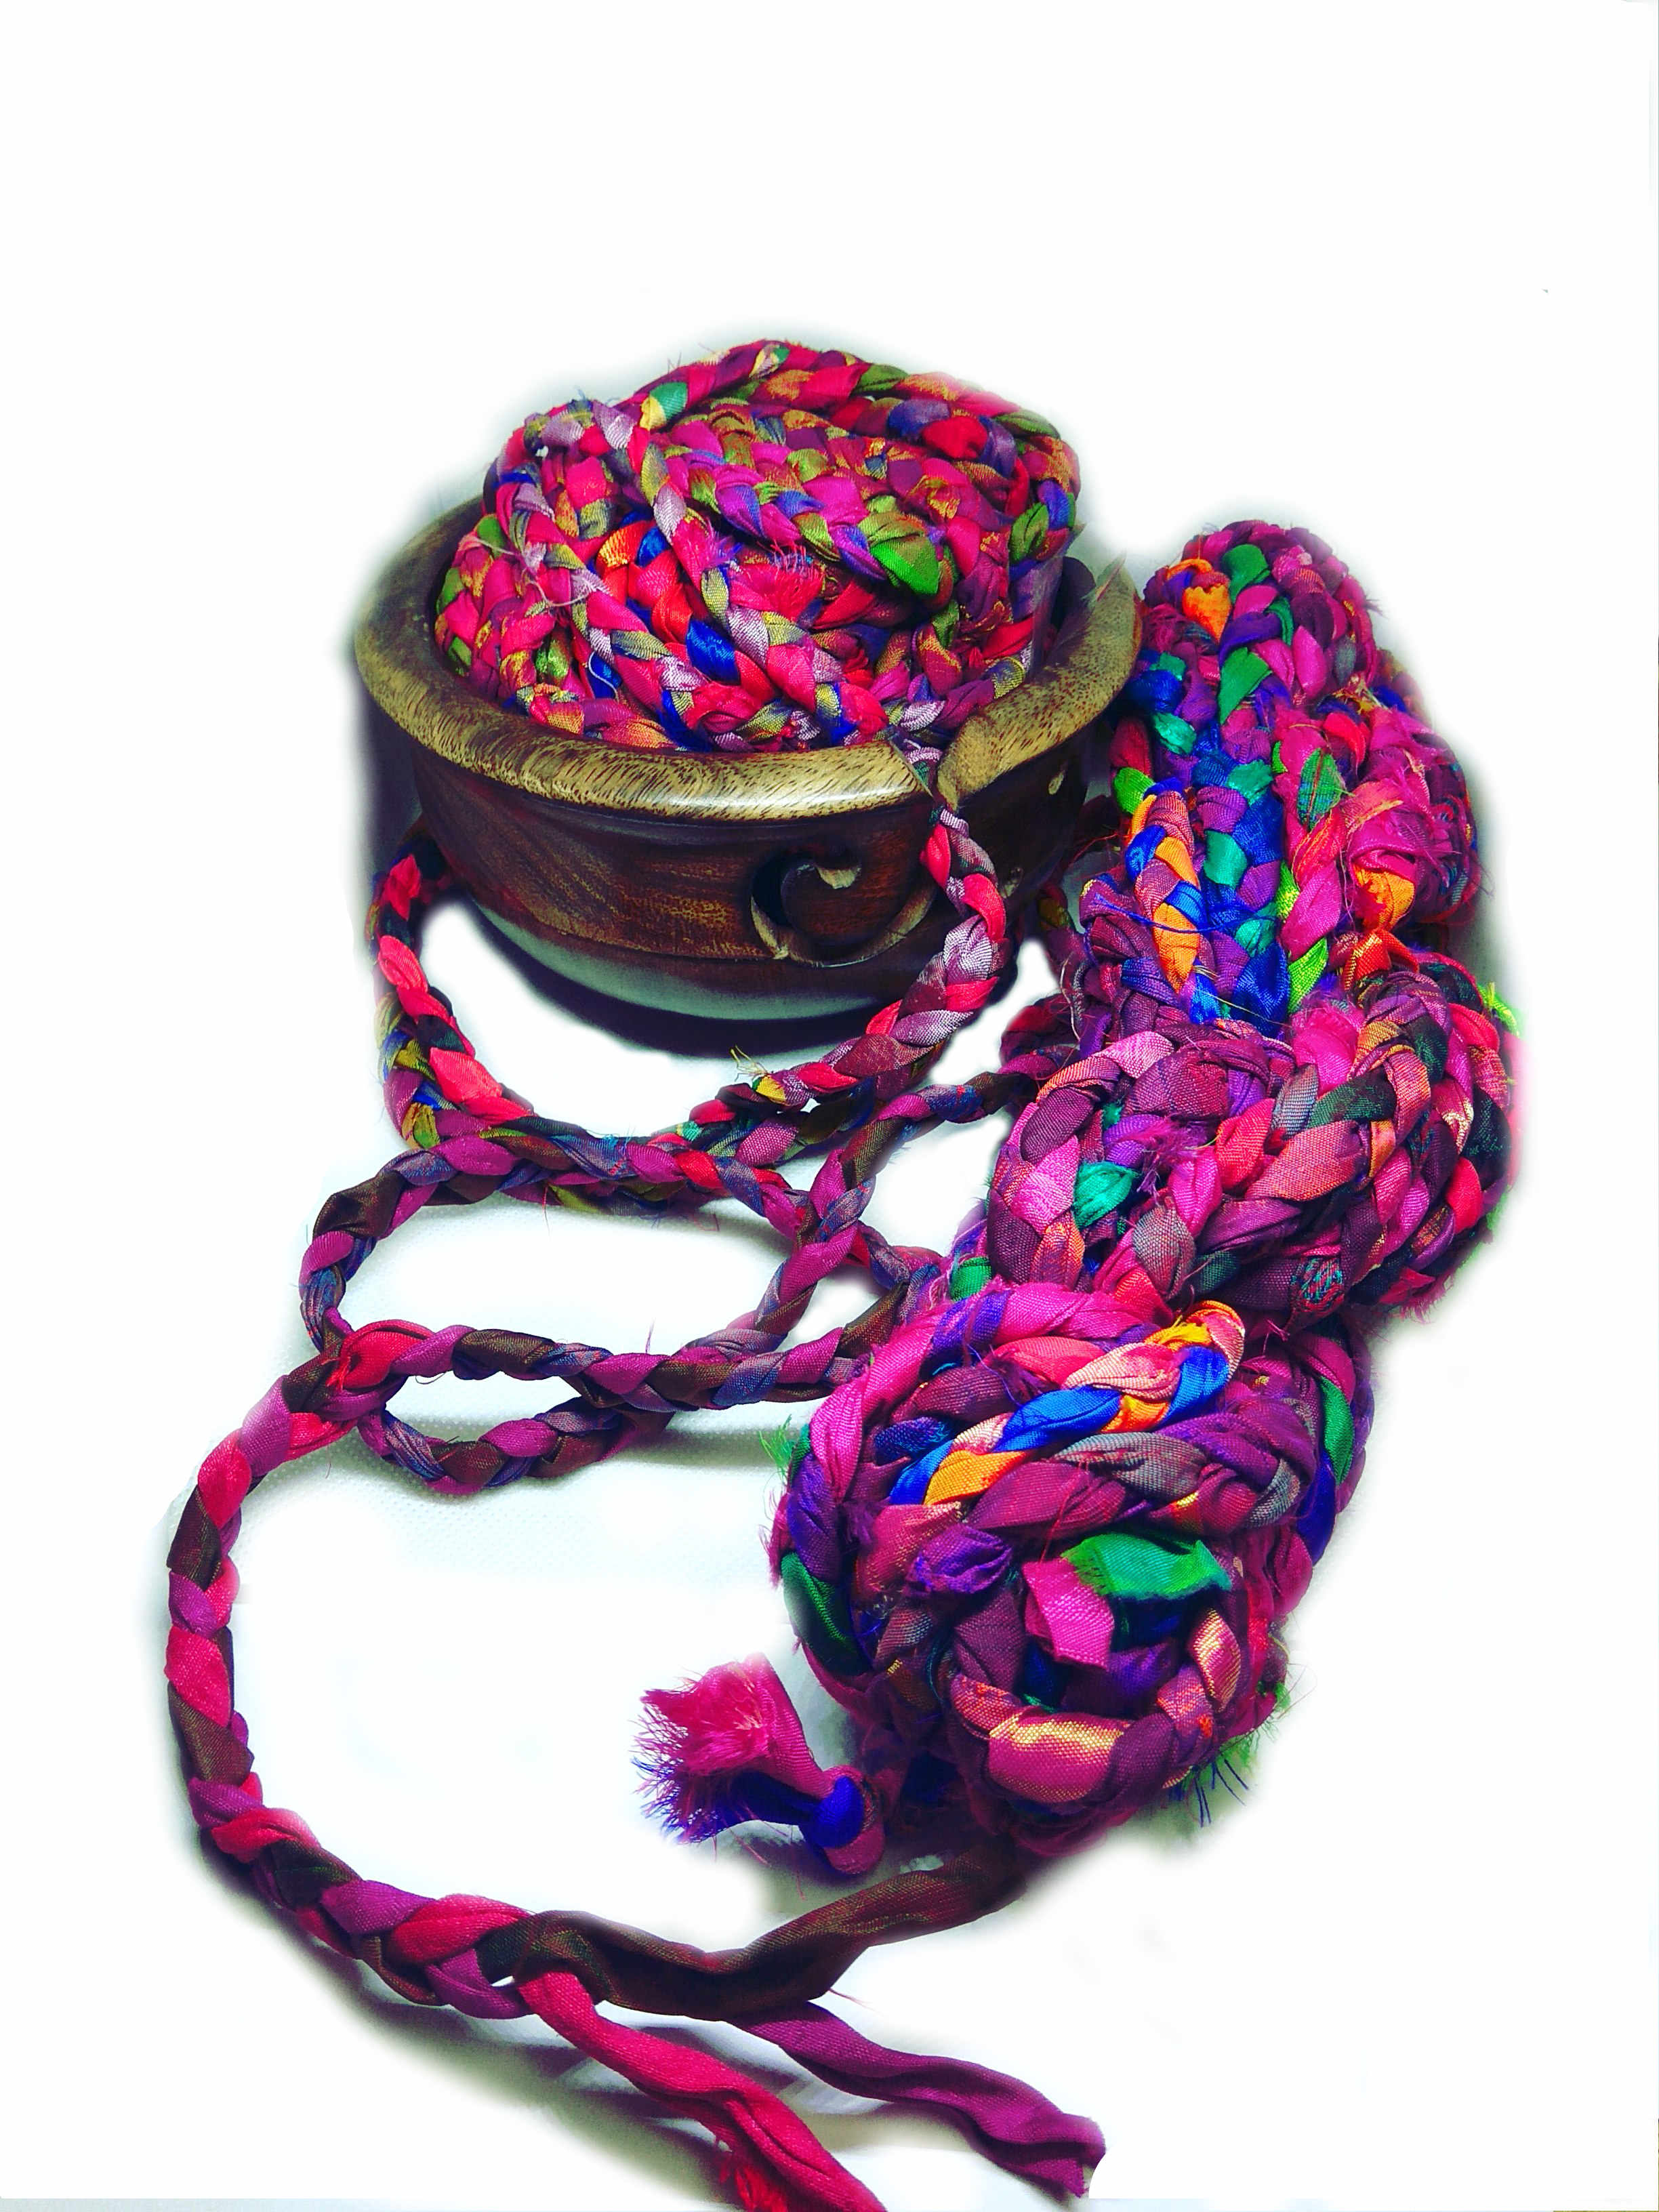 Recycled Multicolor Rope Fabric Art Yarn Recycled Sari Twine Vibrant Art Cord Indian Sari Silk Twine Handmade Cord Cording For Jewelry